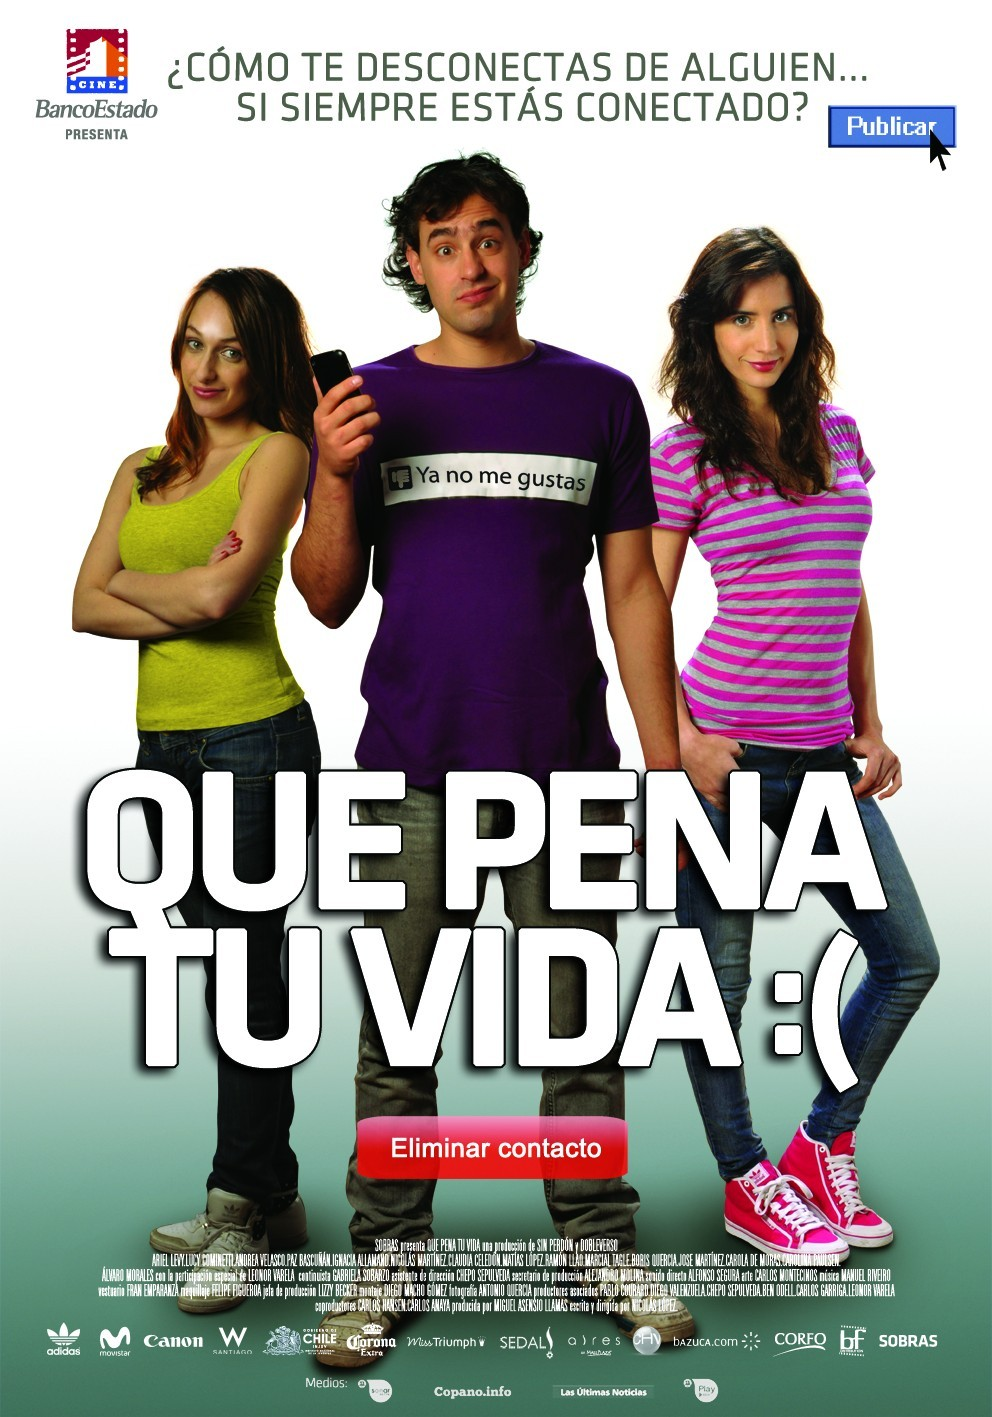 Que pena tu vida(2010) - Cartelera